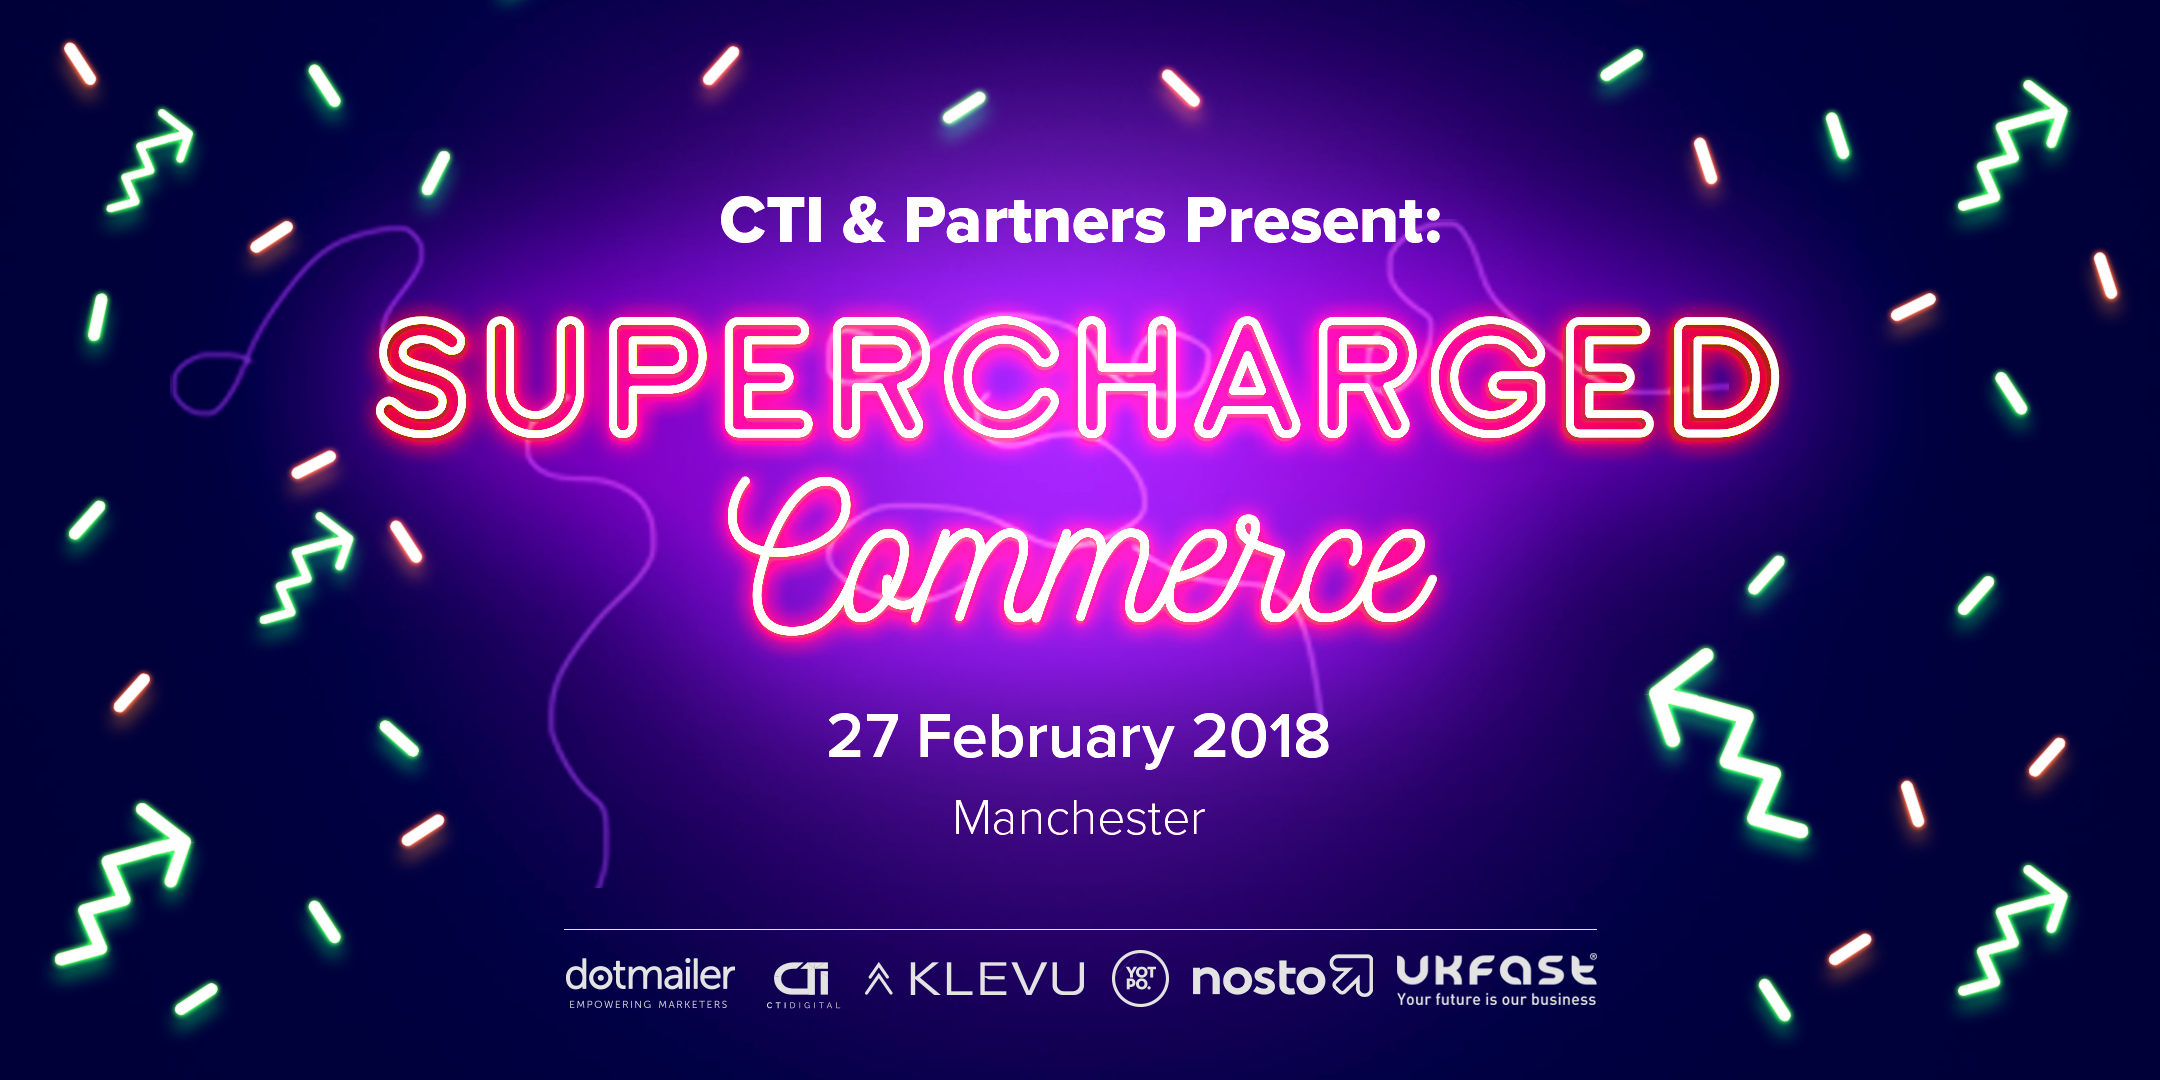 CTI Digital & Partners Present...